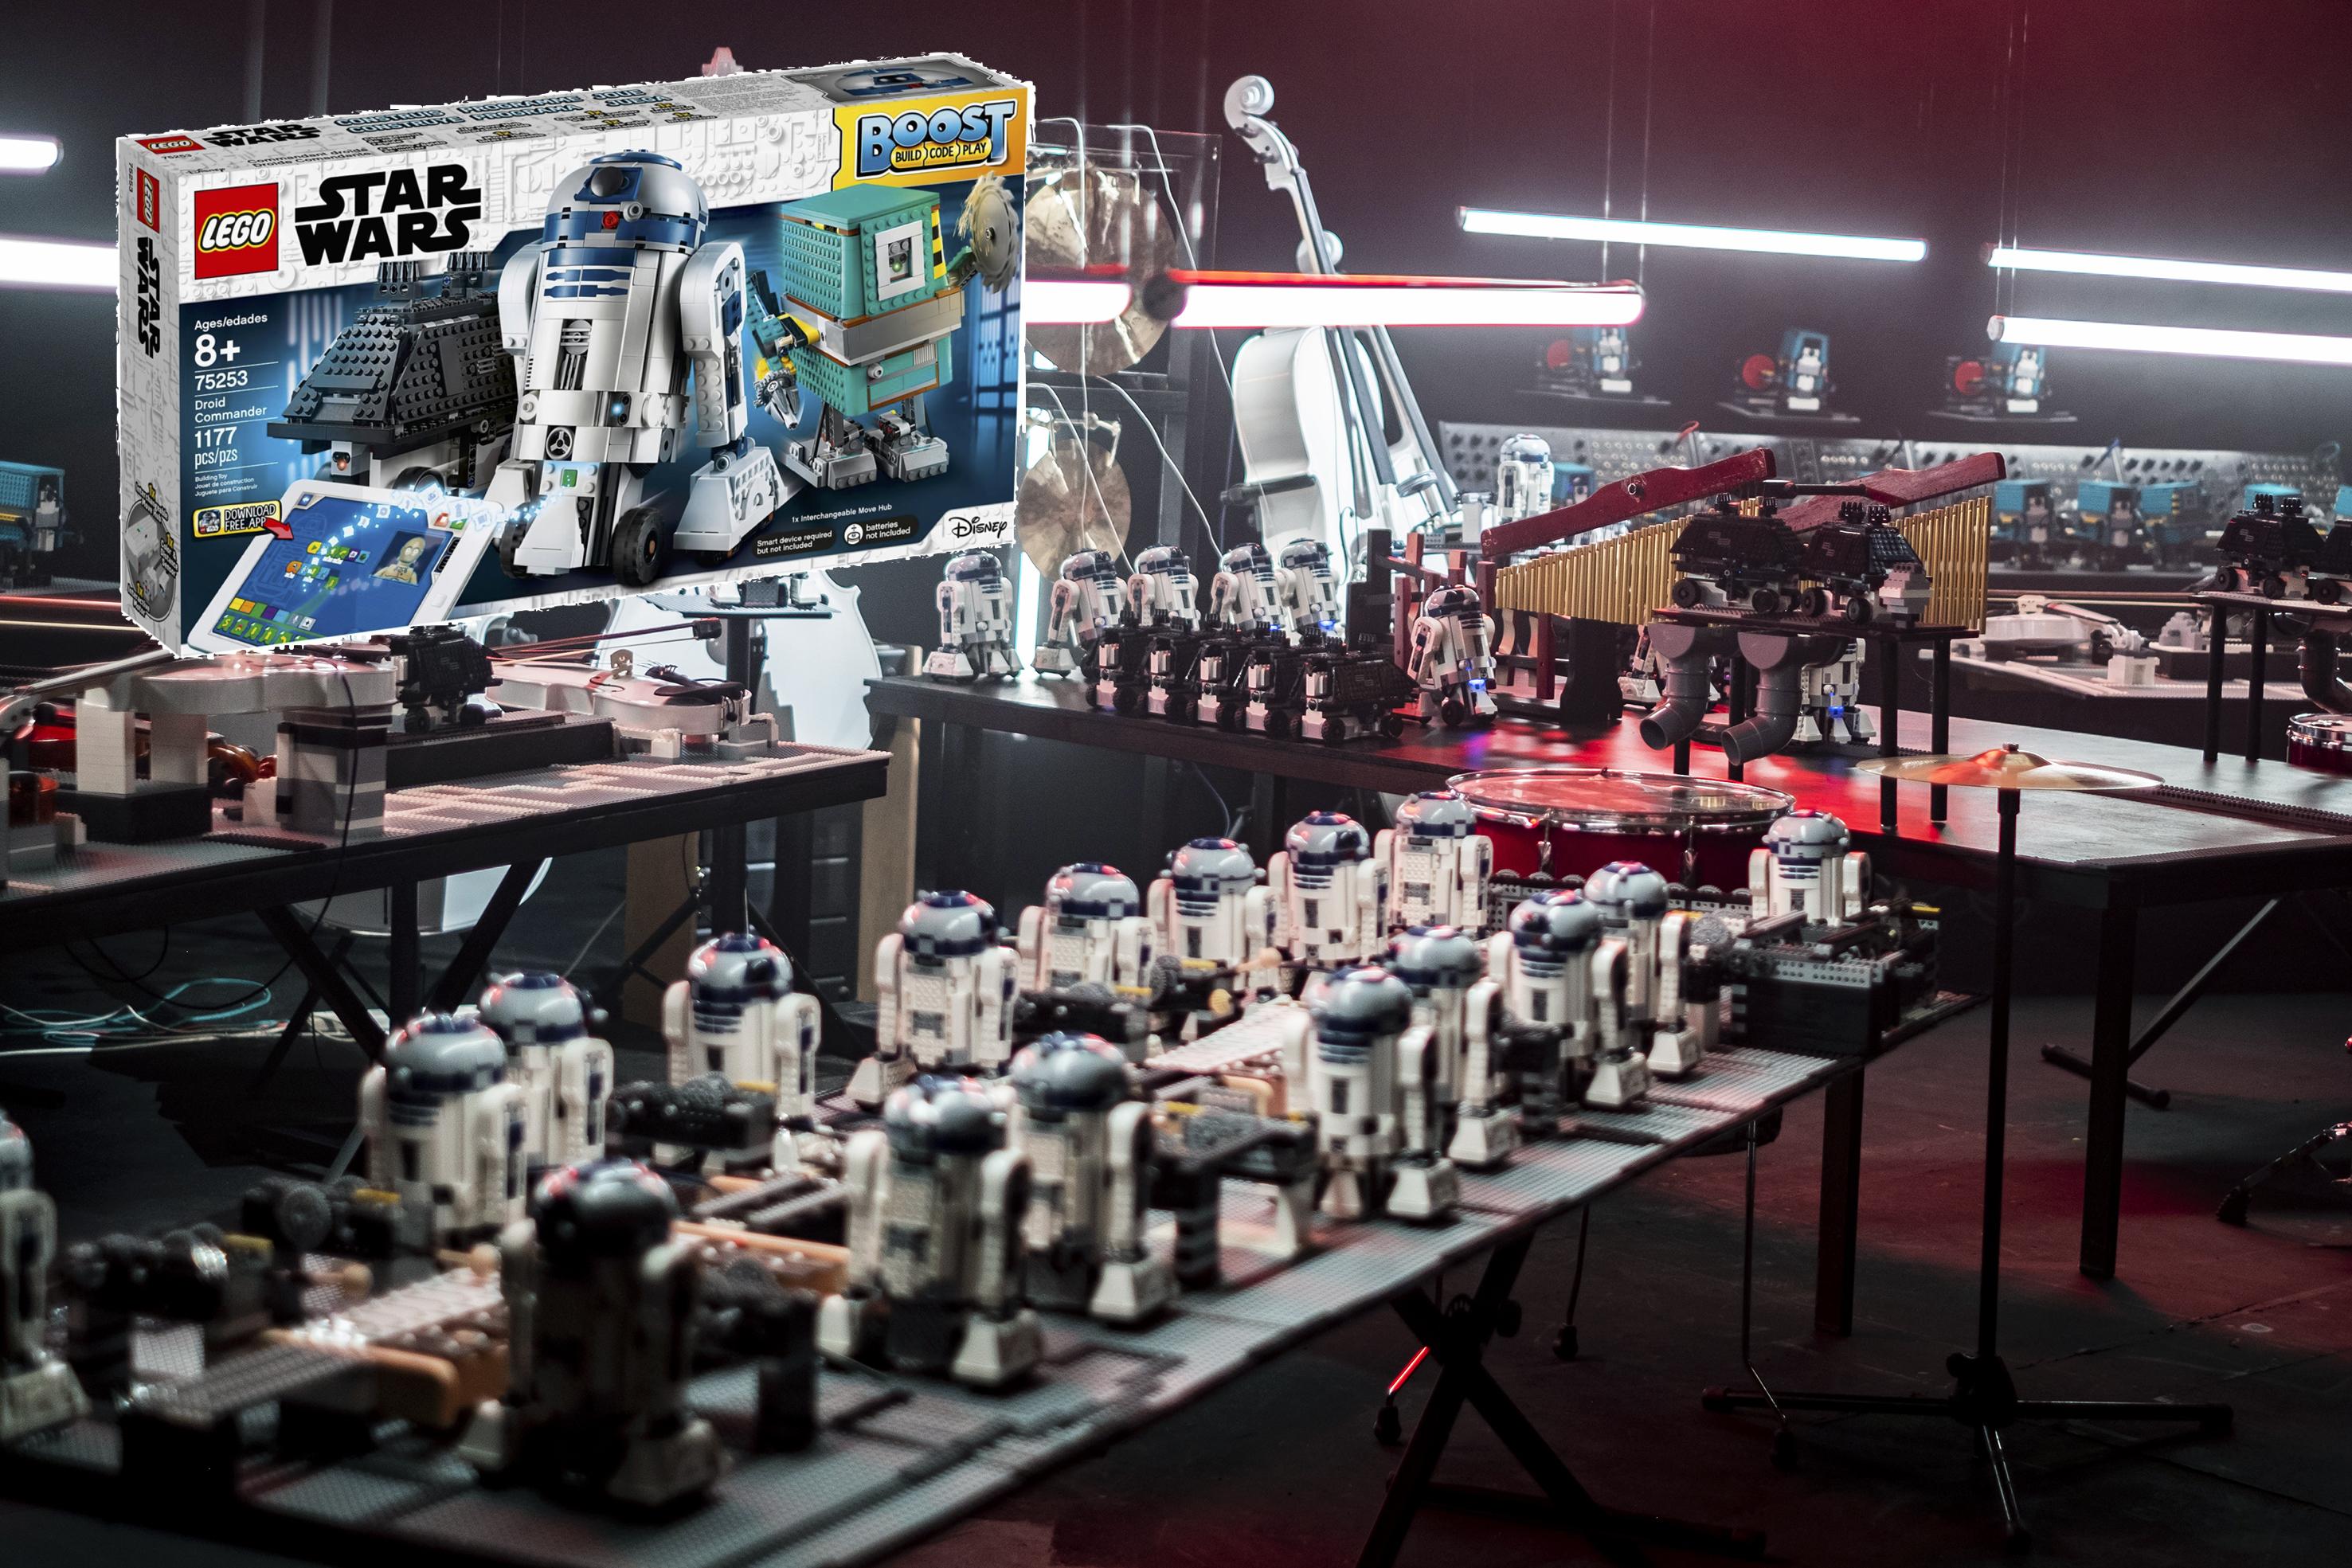 NEW LEGO Star Wars 75253 Boost Droid Commander 1177pcs